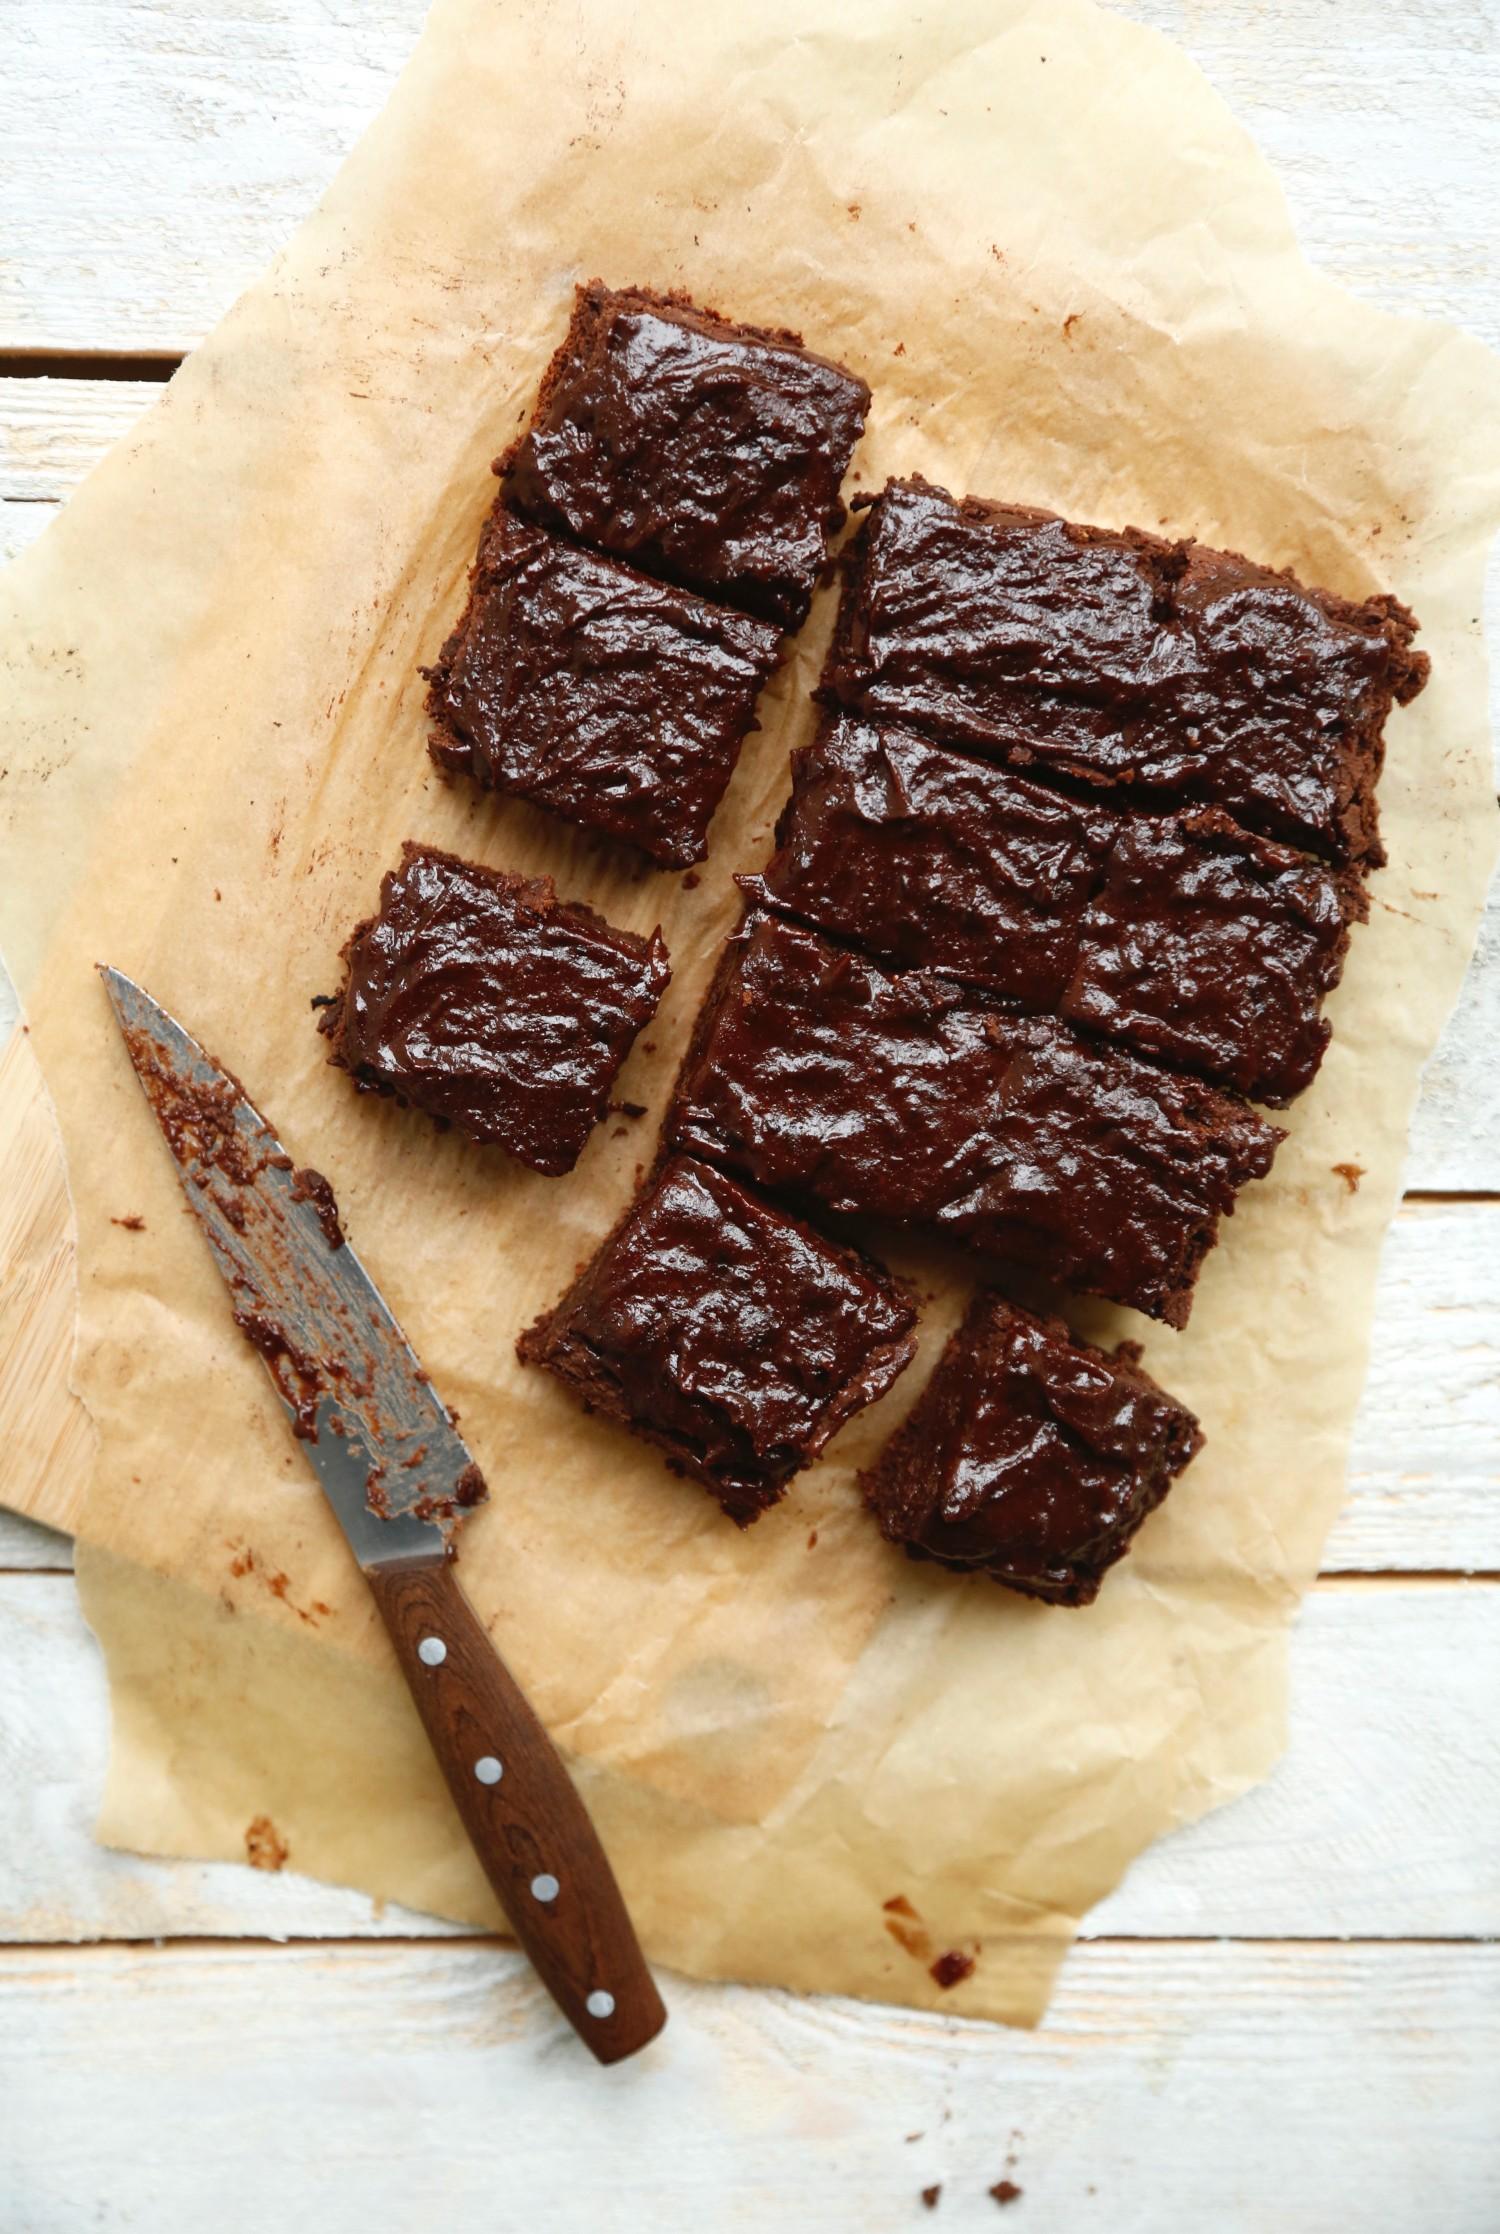 opskrift-laekker-chokoladebrownie-med-kikaerter-3